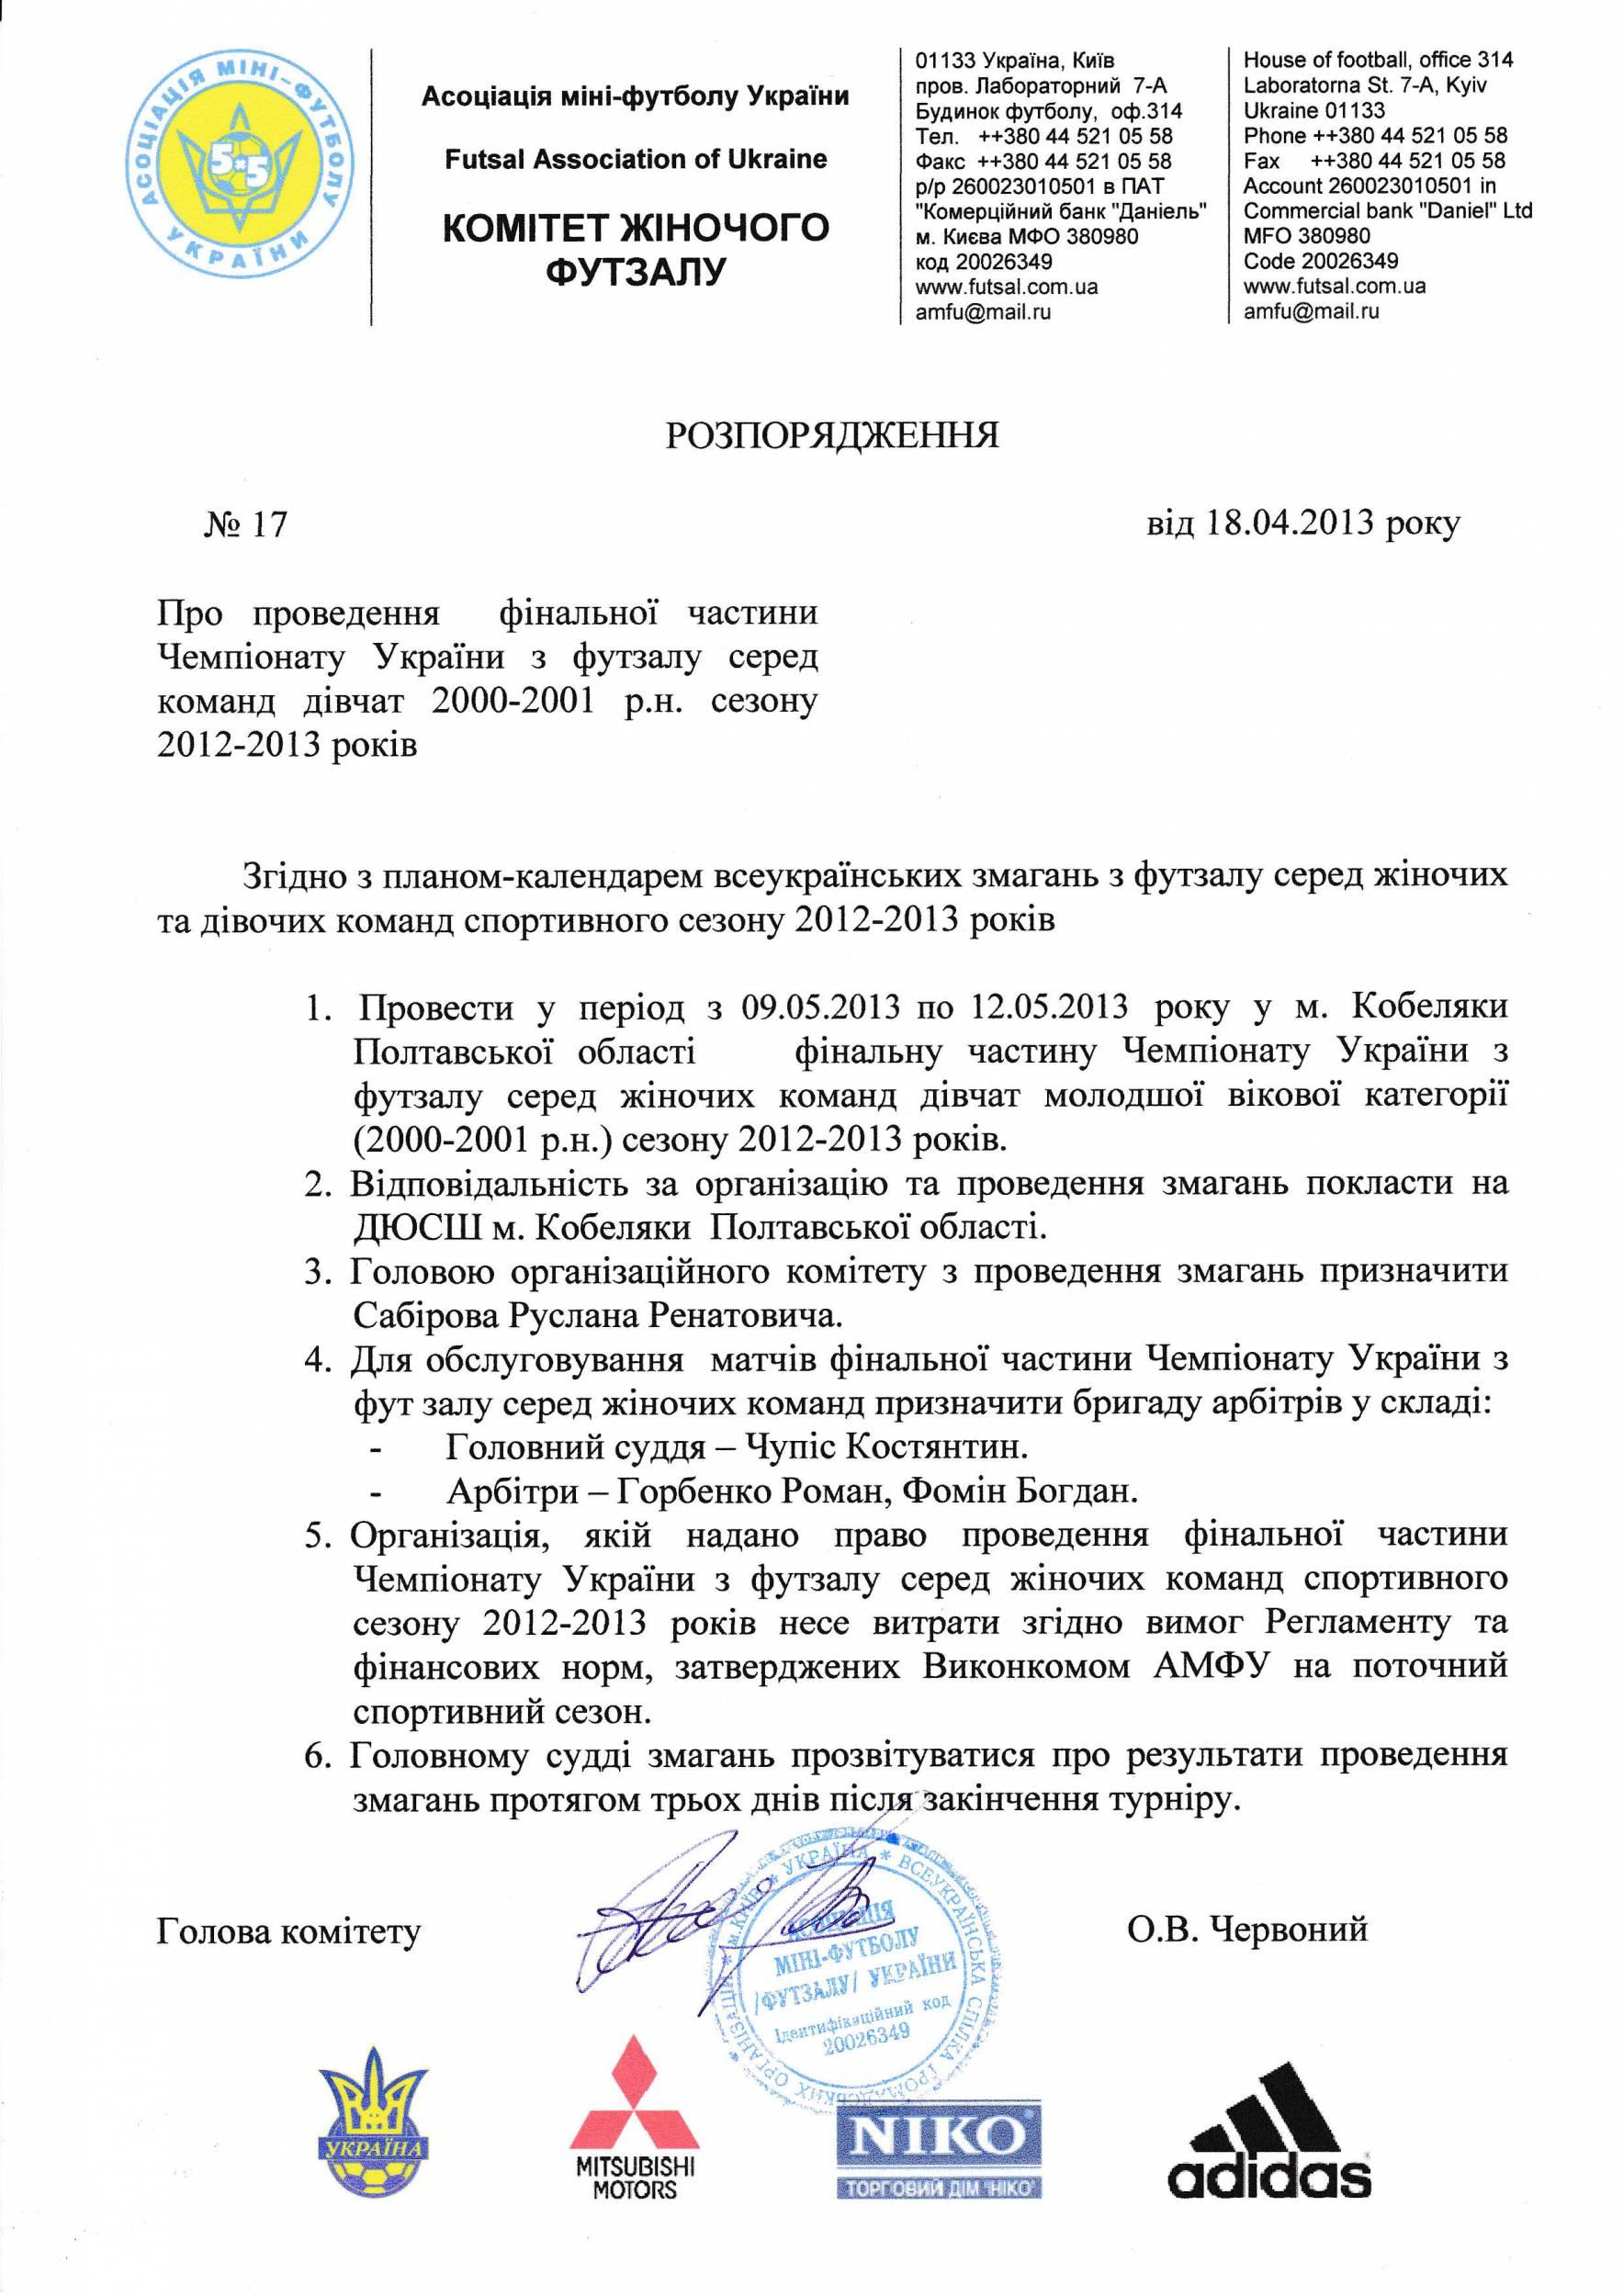 Чемпионат Украины по футзалу среди девушек 2000/2001 г.р. Финал 9 мая!